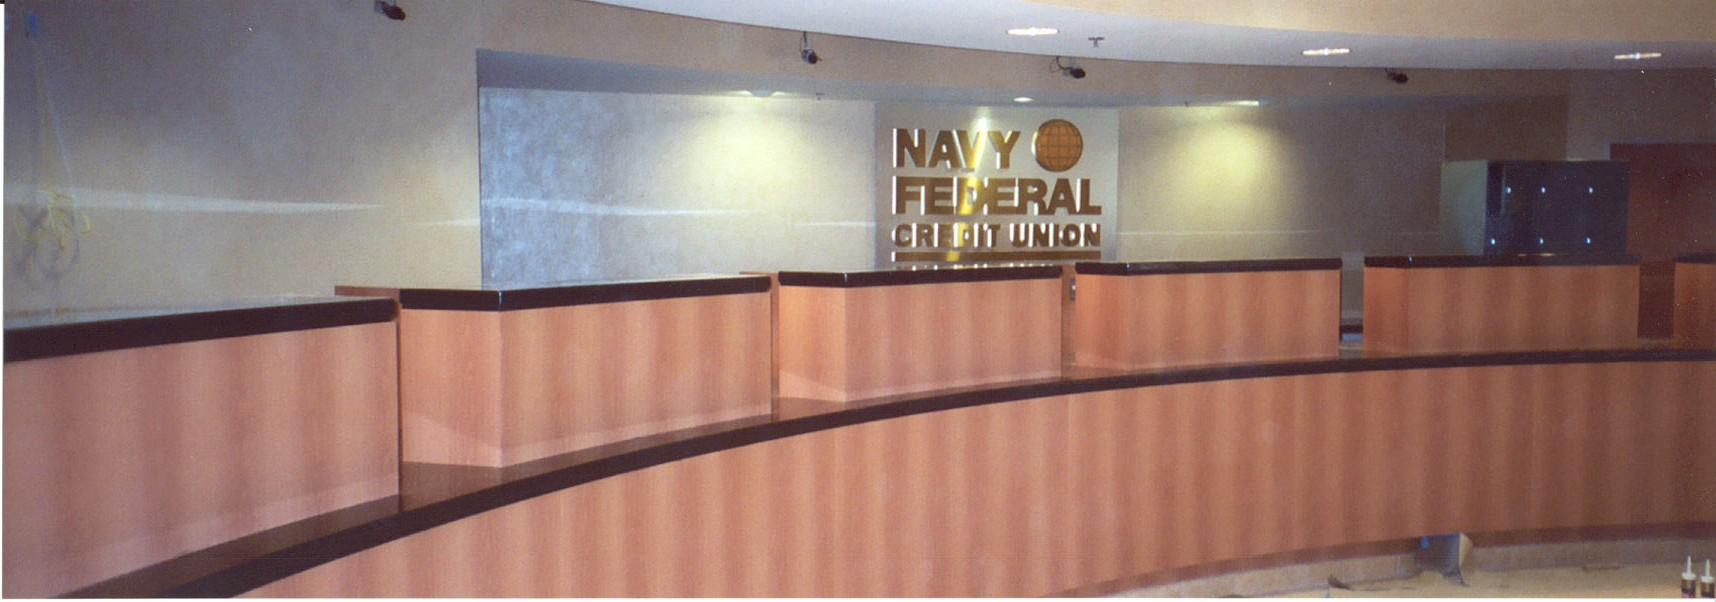 navyfederalin.jpg